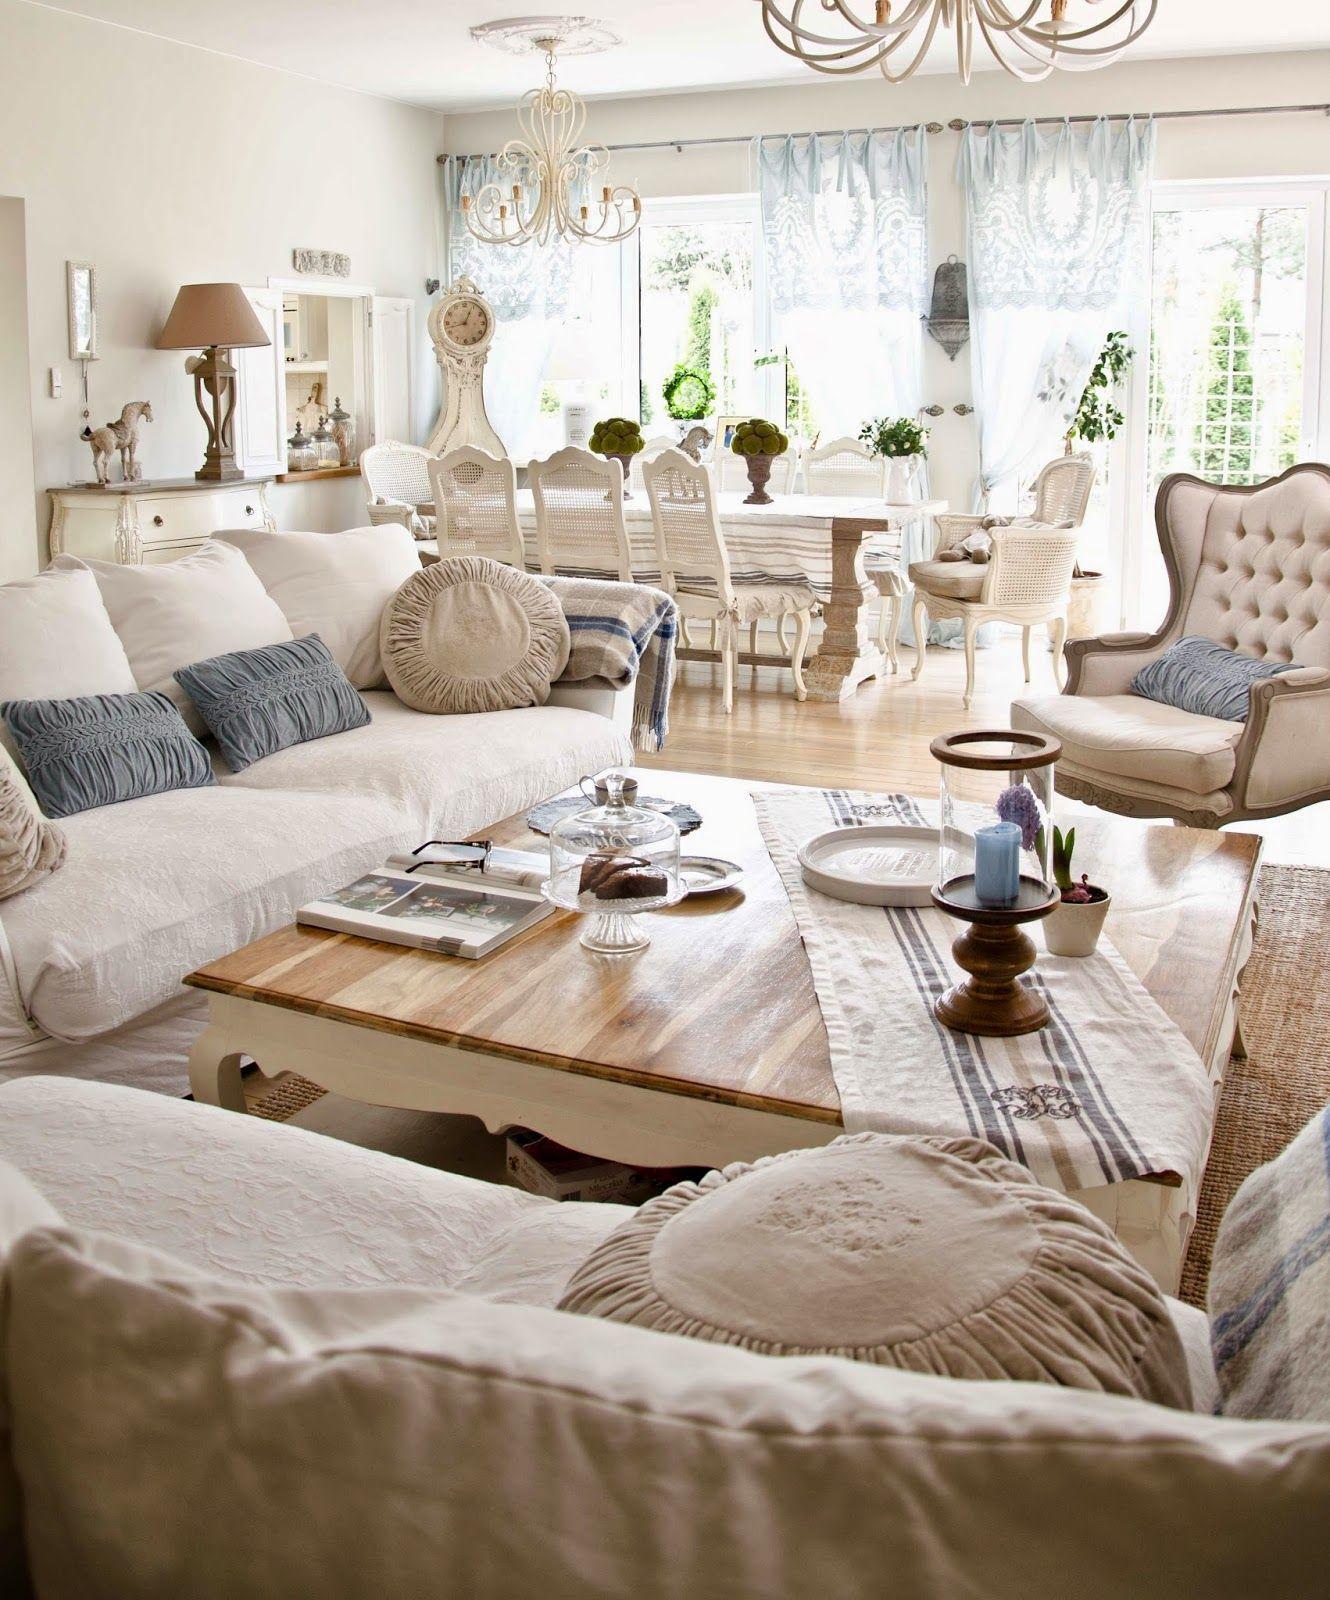 Bellemaison Inspiracje Niebiesko Nam Country Style Living Room French Country Living Room French Living Room Decor